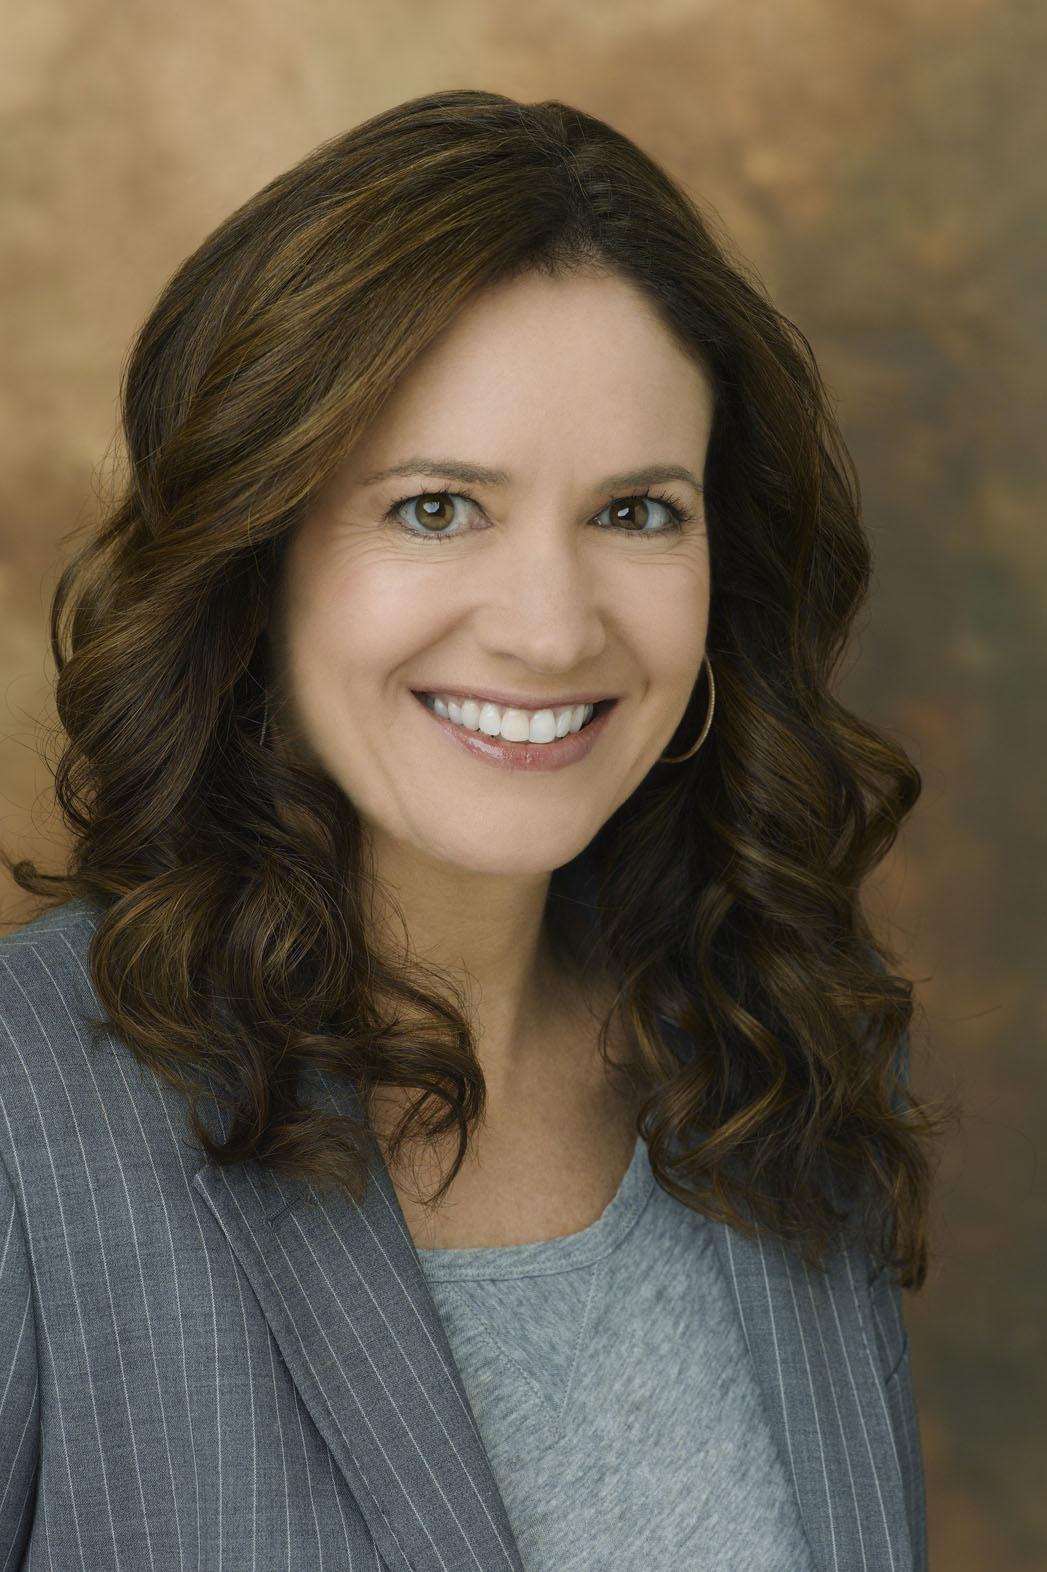 Tracy Underwood Headshot - P 2013